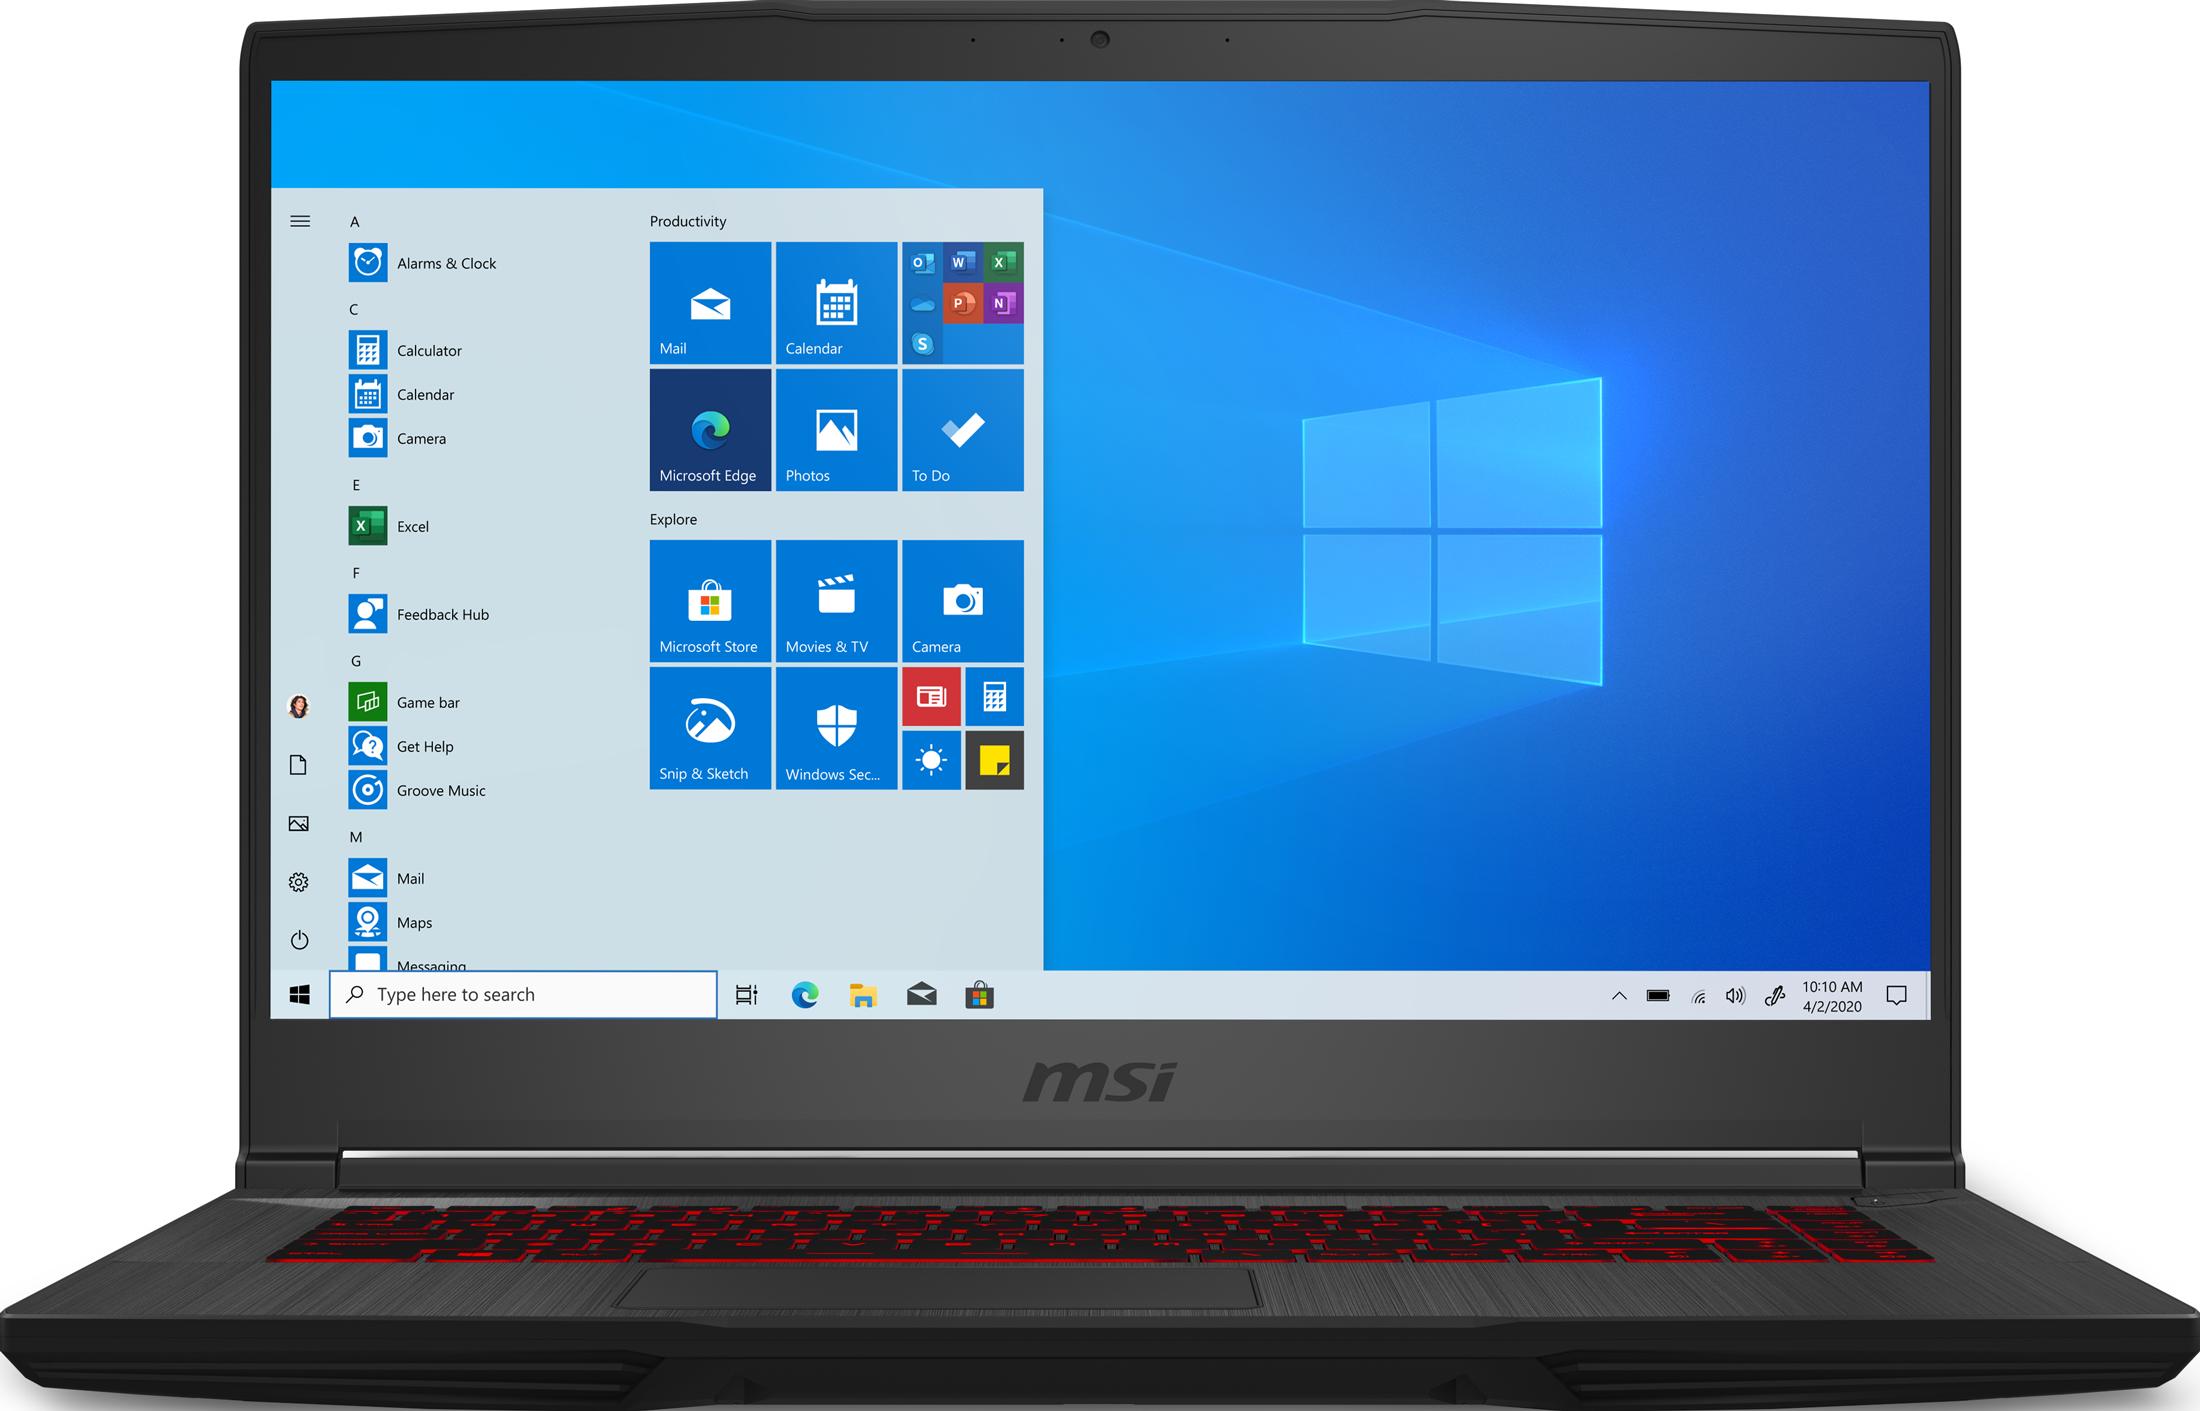 MSI GF65 Thin 15.6 Gaming Laptop 15.6-inch Full HD LCD Display Intel Core i7-10750H 16 GB memory/512 GB SSD NVIDIA RTX3060